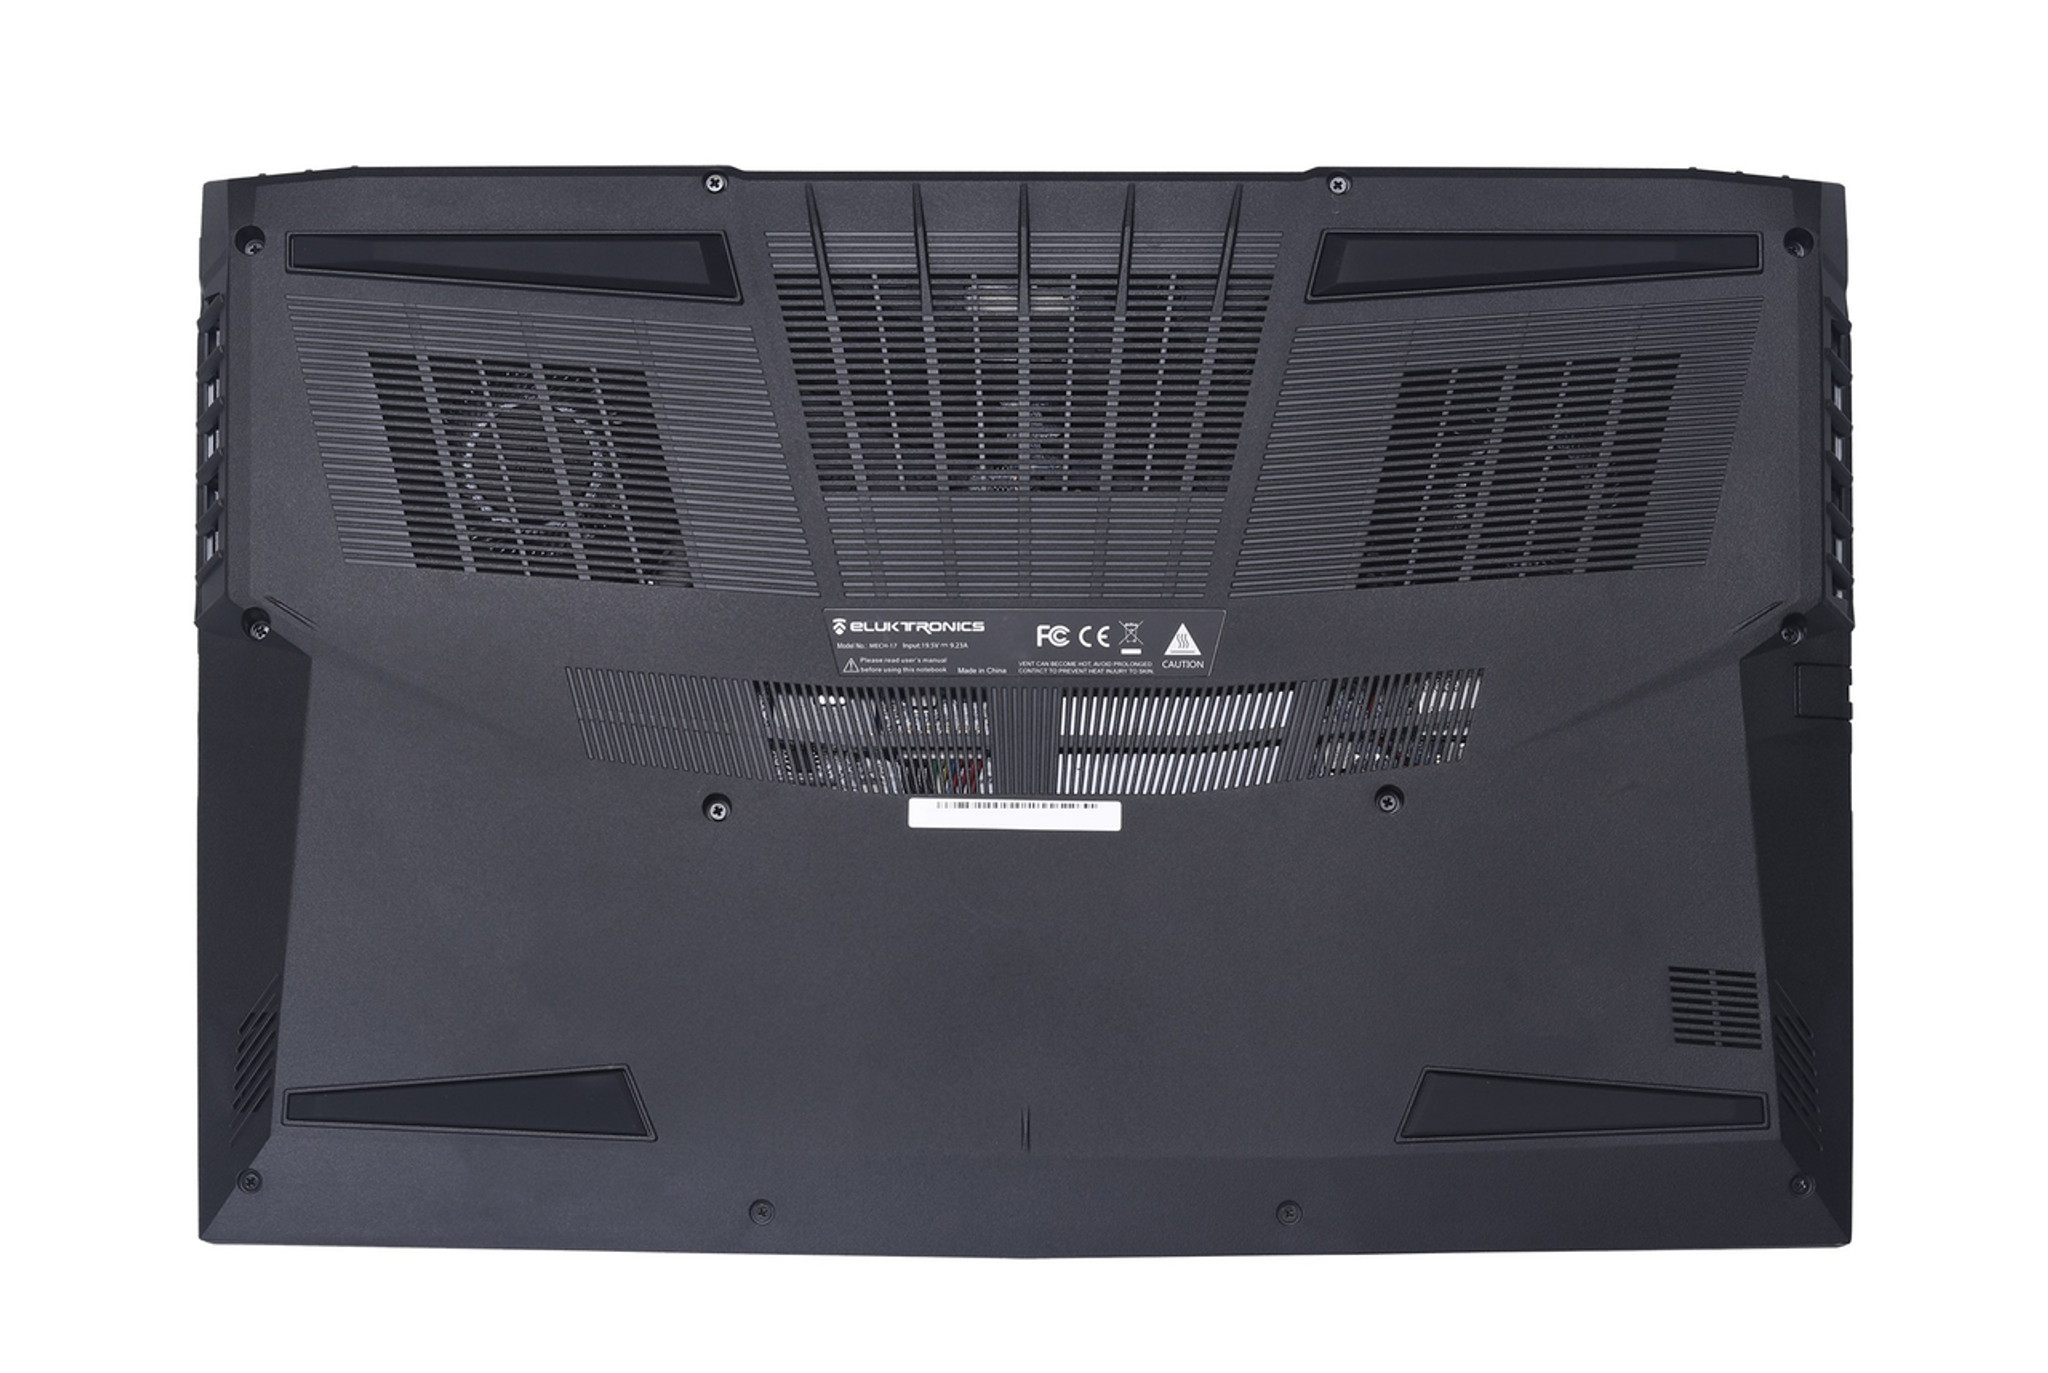 medium resolution of eluktronics mech 17 g1r slim light series 17 3 inch premium gaming laptop with